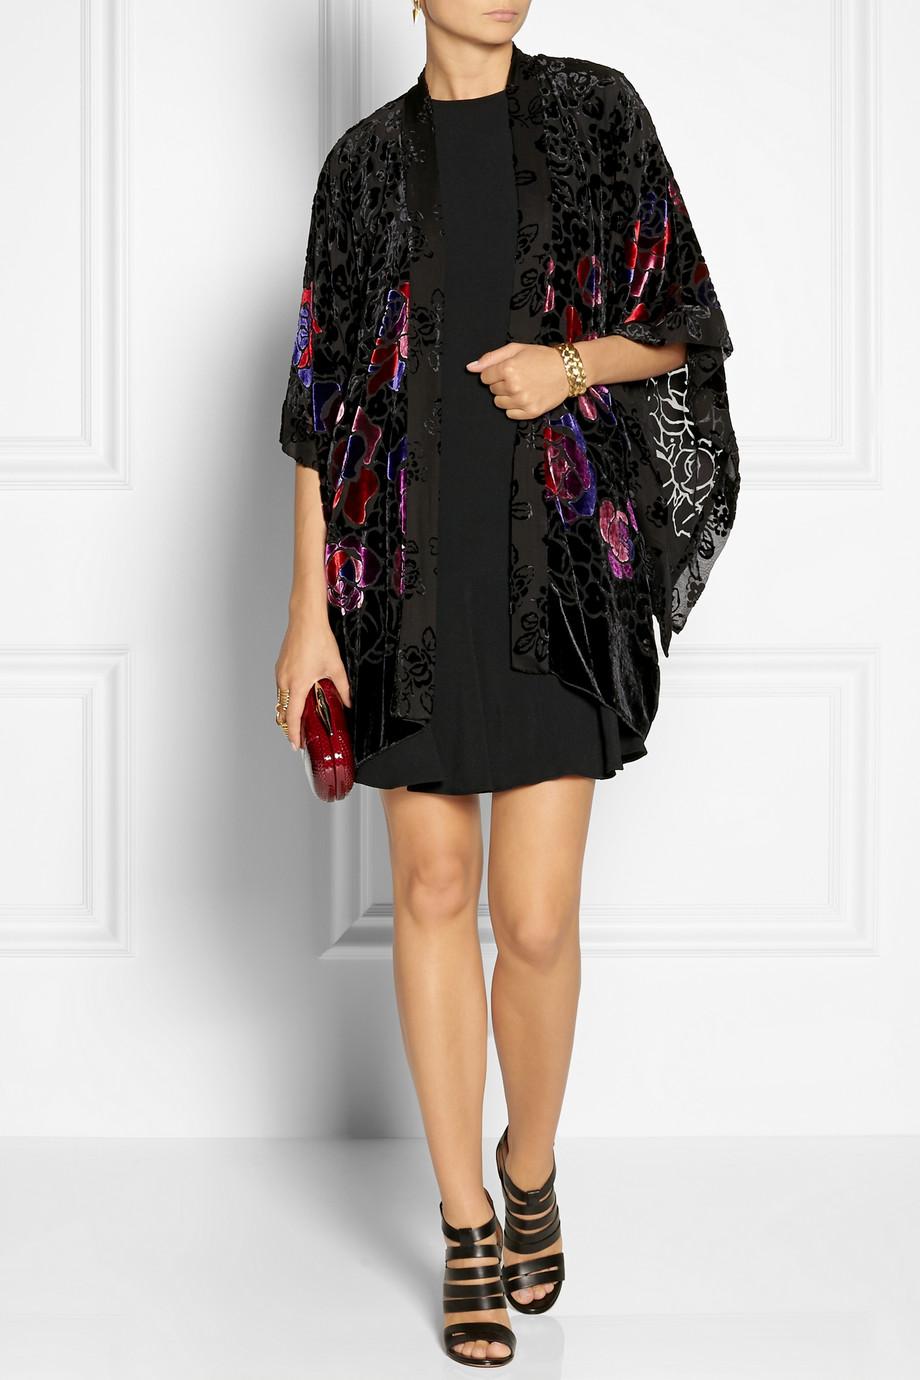 Anna Sui Rose Patterned Burnout Velvet Kimono Style Jacket